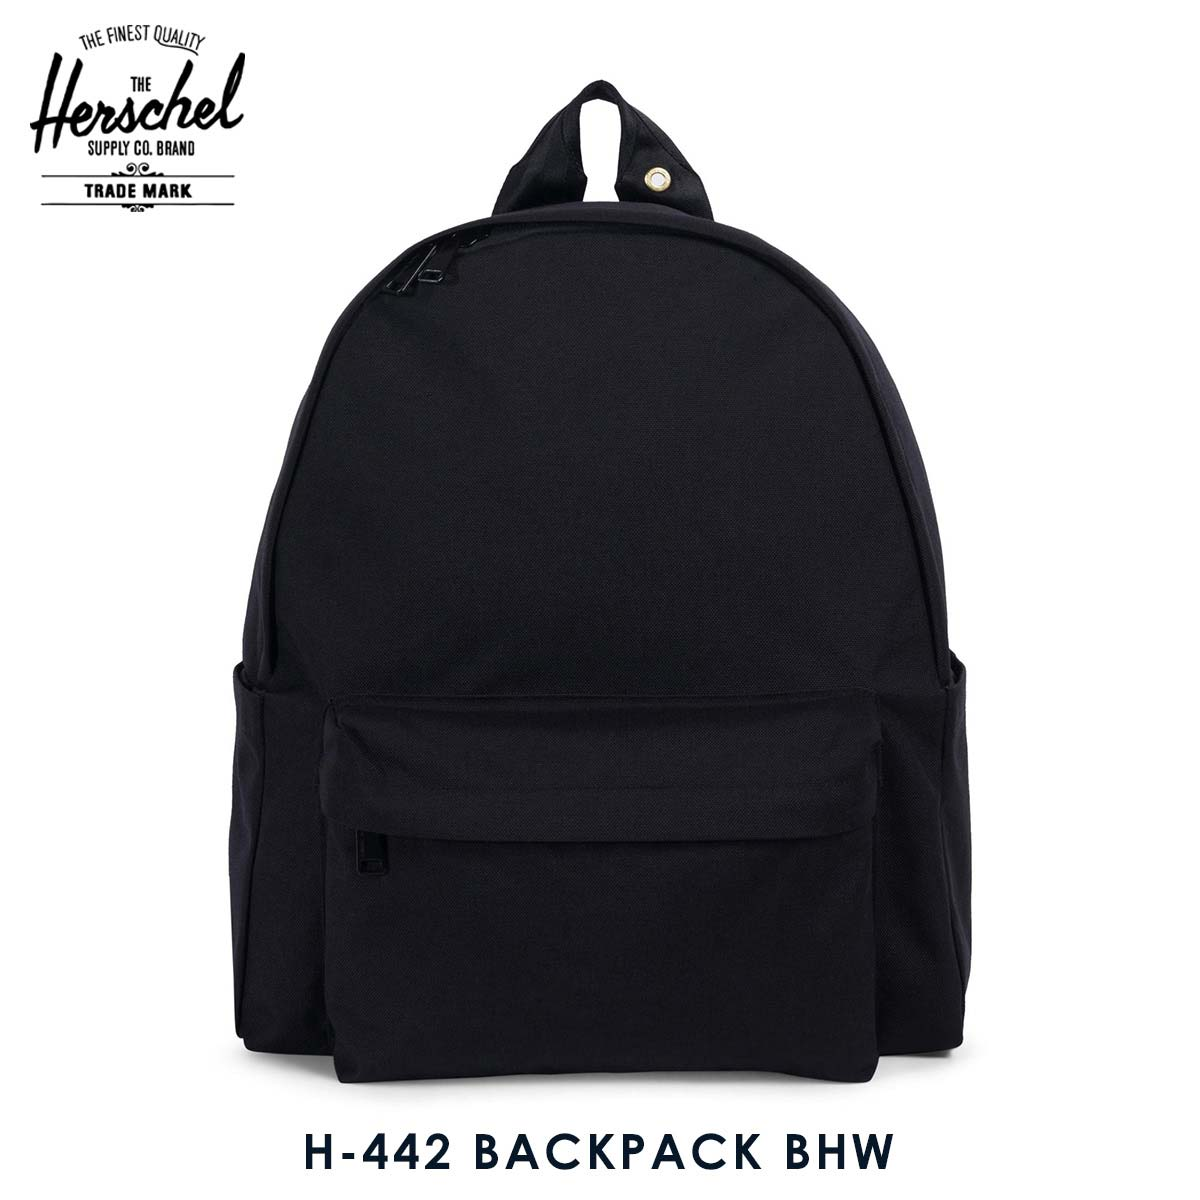 578b750cb8da Hershel supply Herschel Supply regular store bag rucksack backpack H-442  BACKPACK BHW 10416-01981-OS BLACK